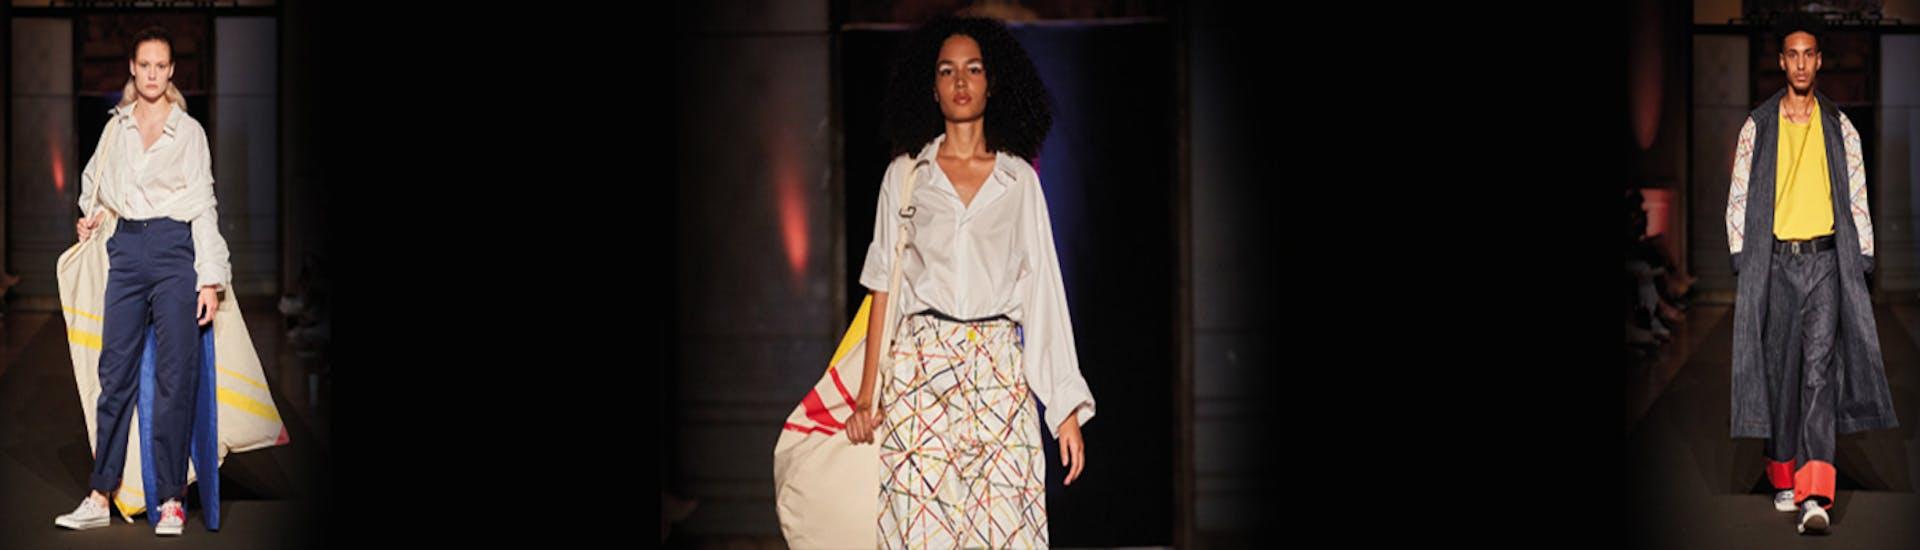 Fashion Design Textile Design Bachelor Lisaa School Of Design Paris France Mastersportal Com